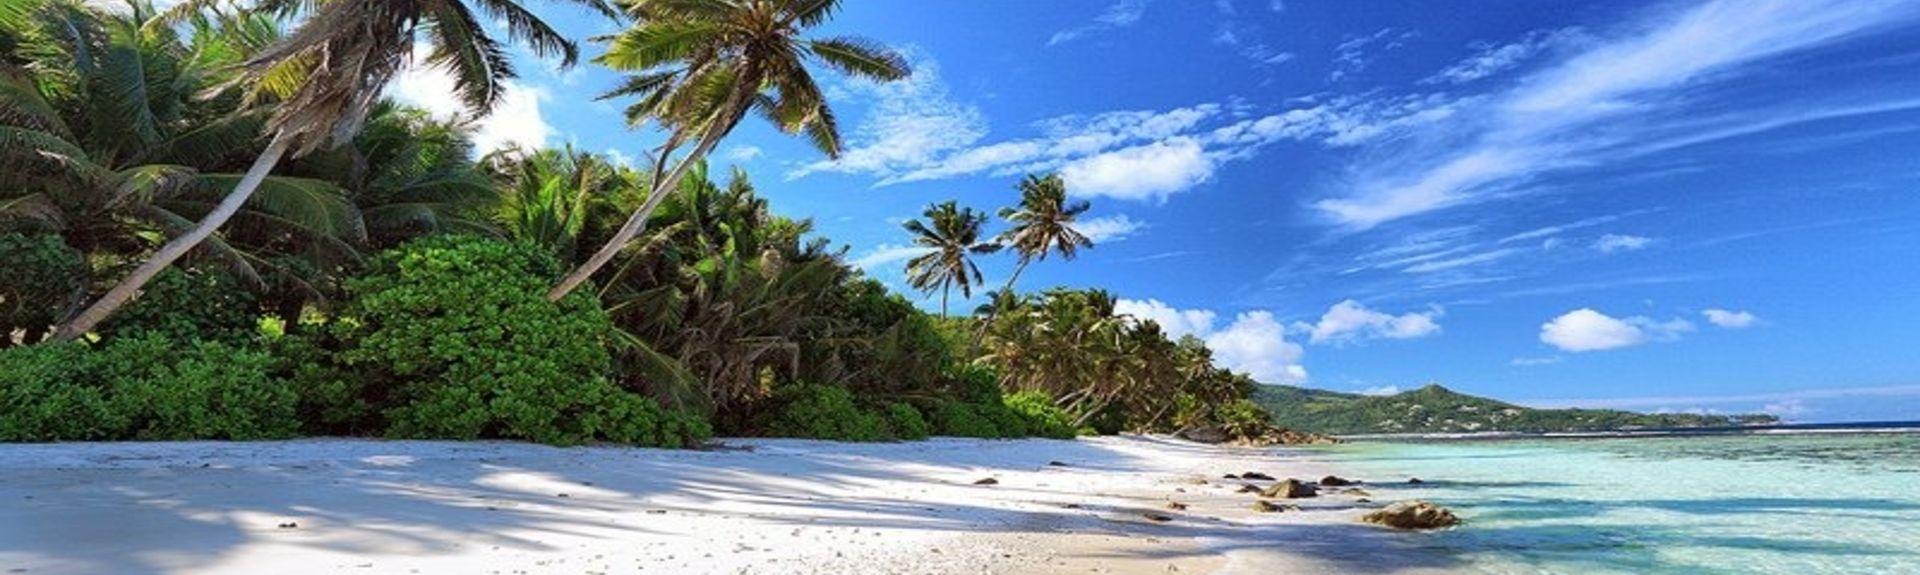 Beau Vallon Beach, Mahe Island, Seychelles